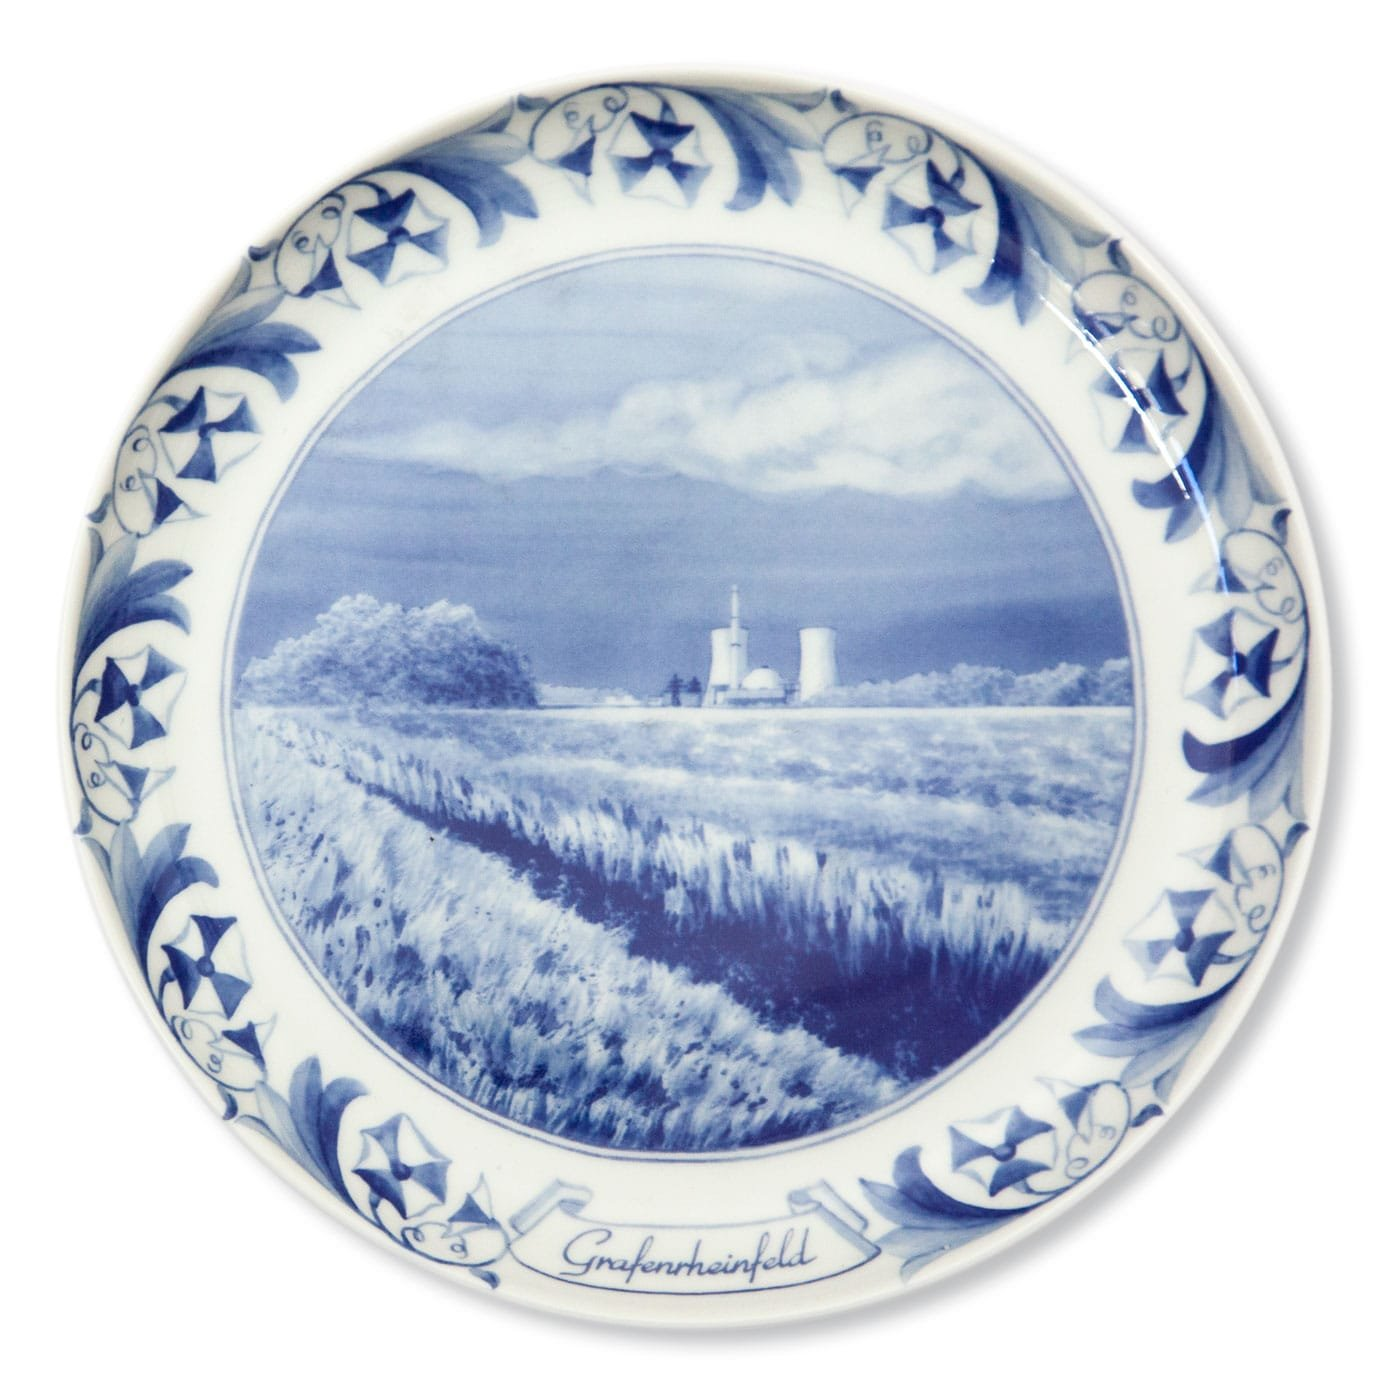 porcelain-nuclear-reactors-plates-grafenrheinfeld